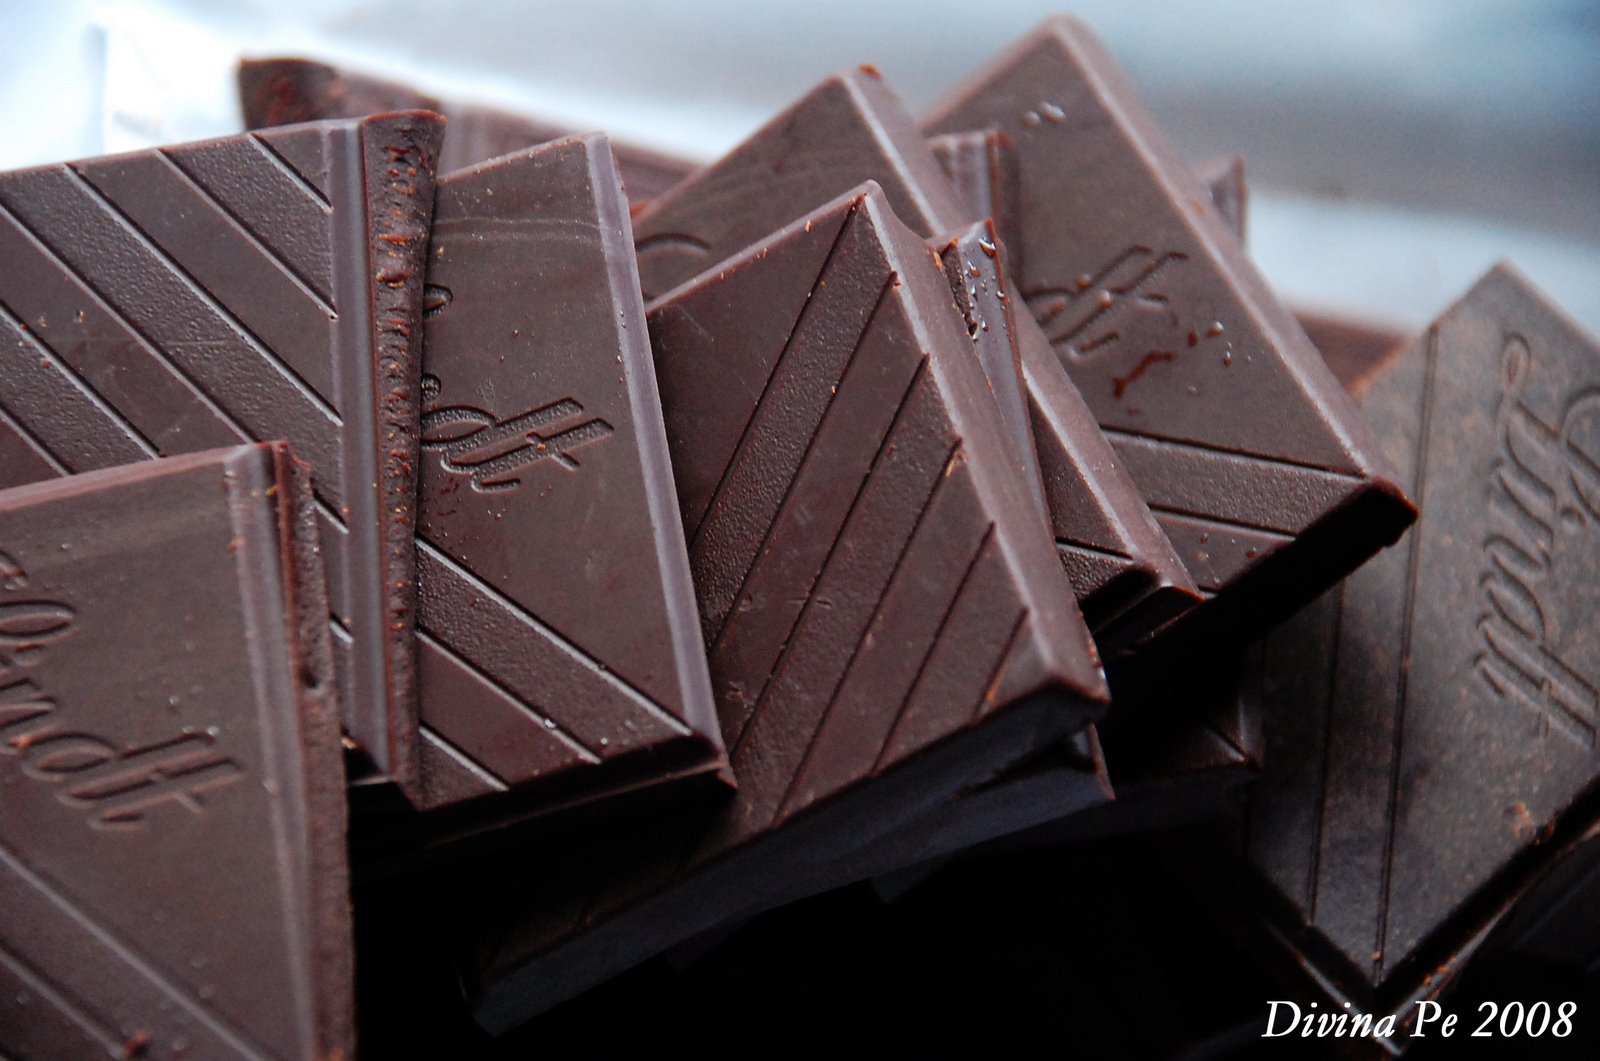 10 Health Benefits Of Dark Chocolate - The Trent